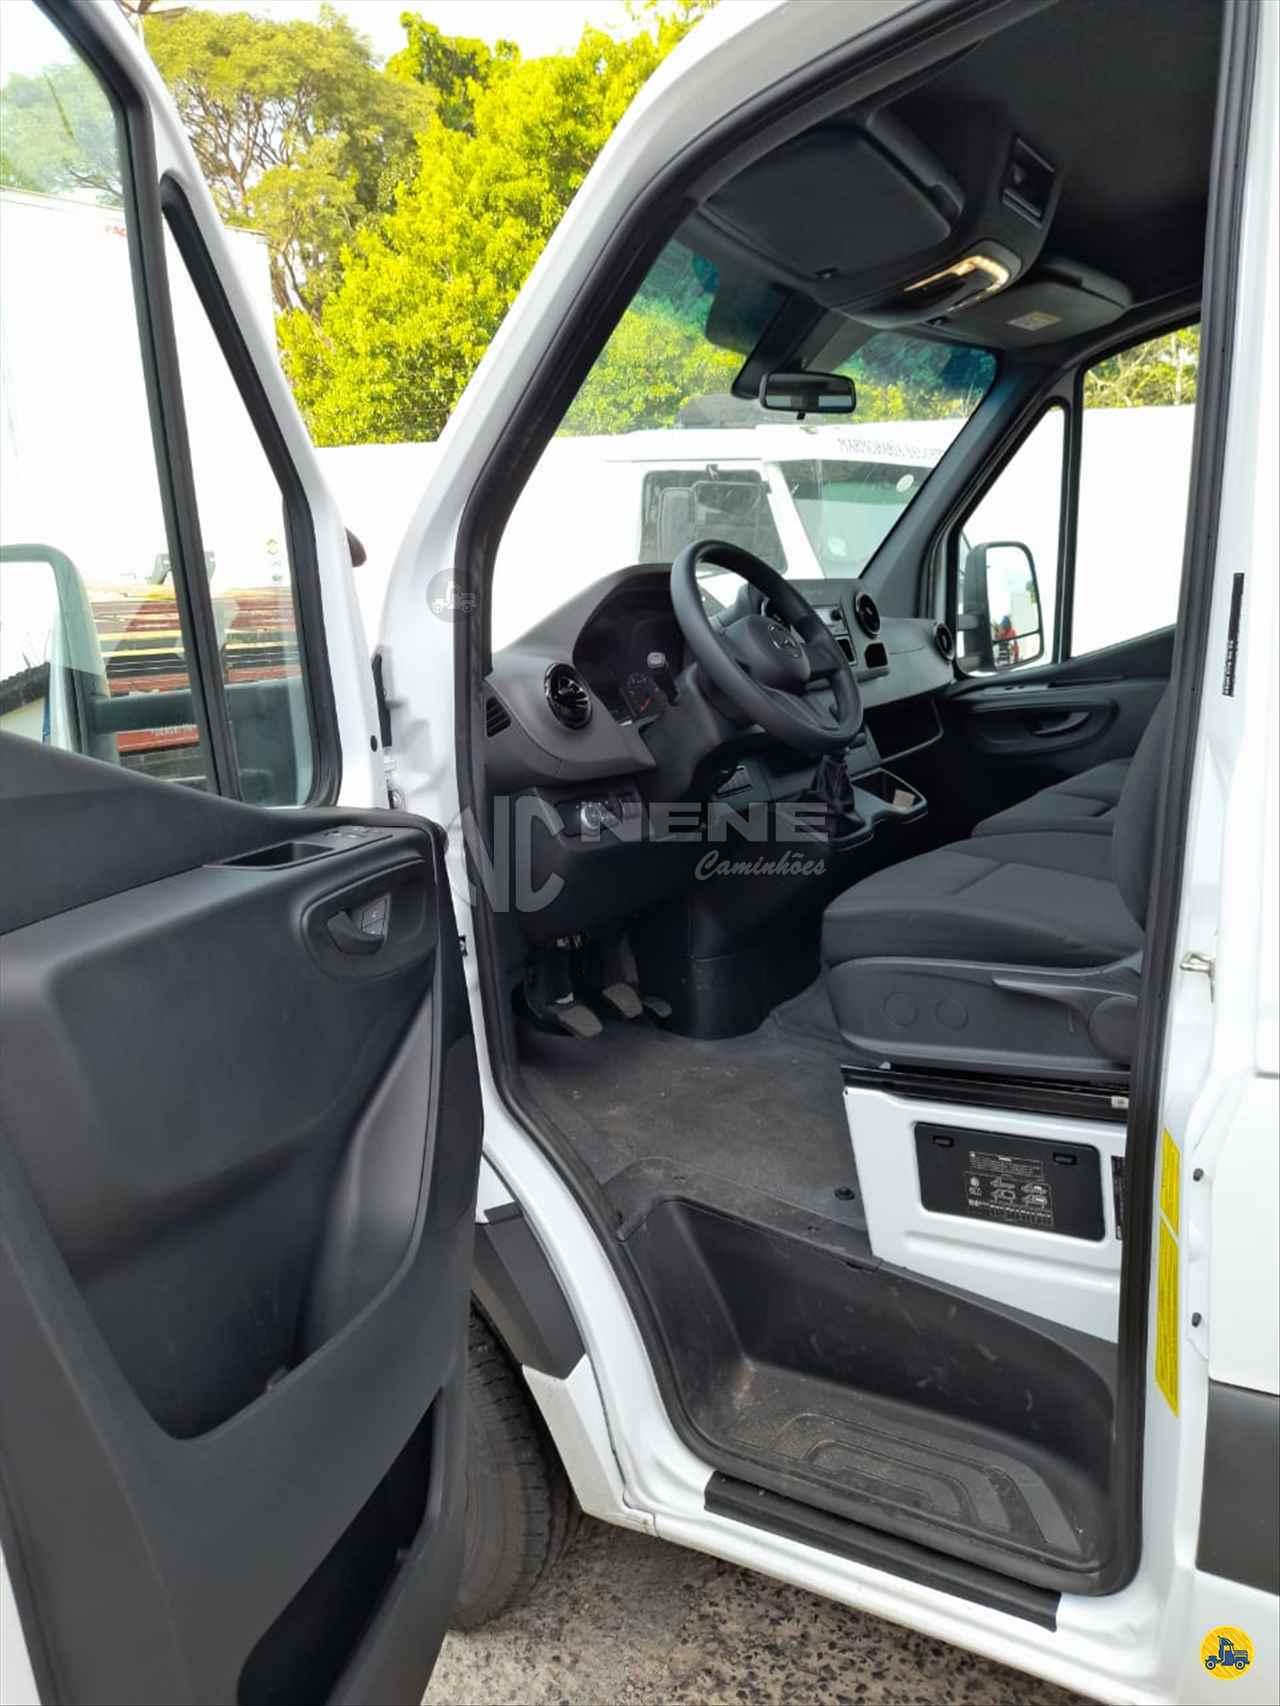 MERCEDES-BENZ Sprinter Chassi 515  2021/2021 Nene Caminhões